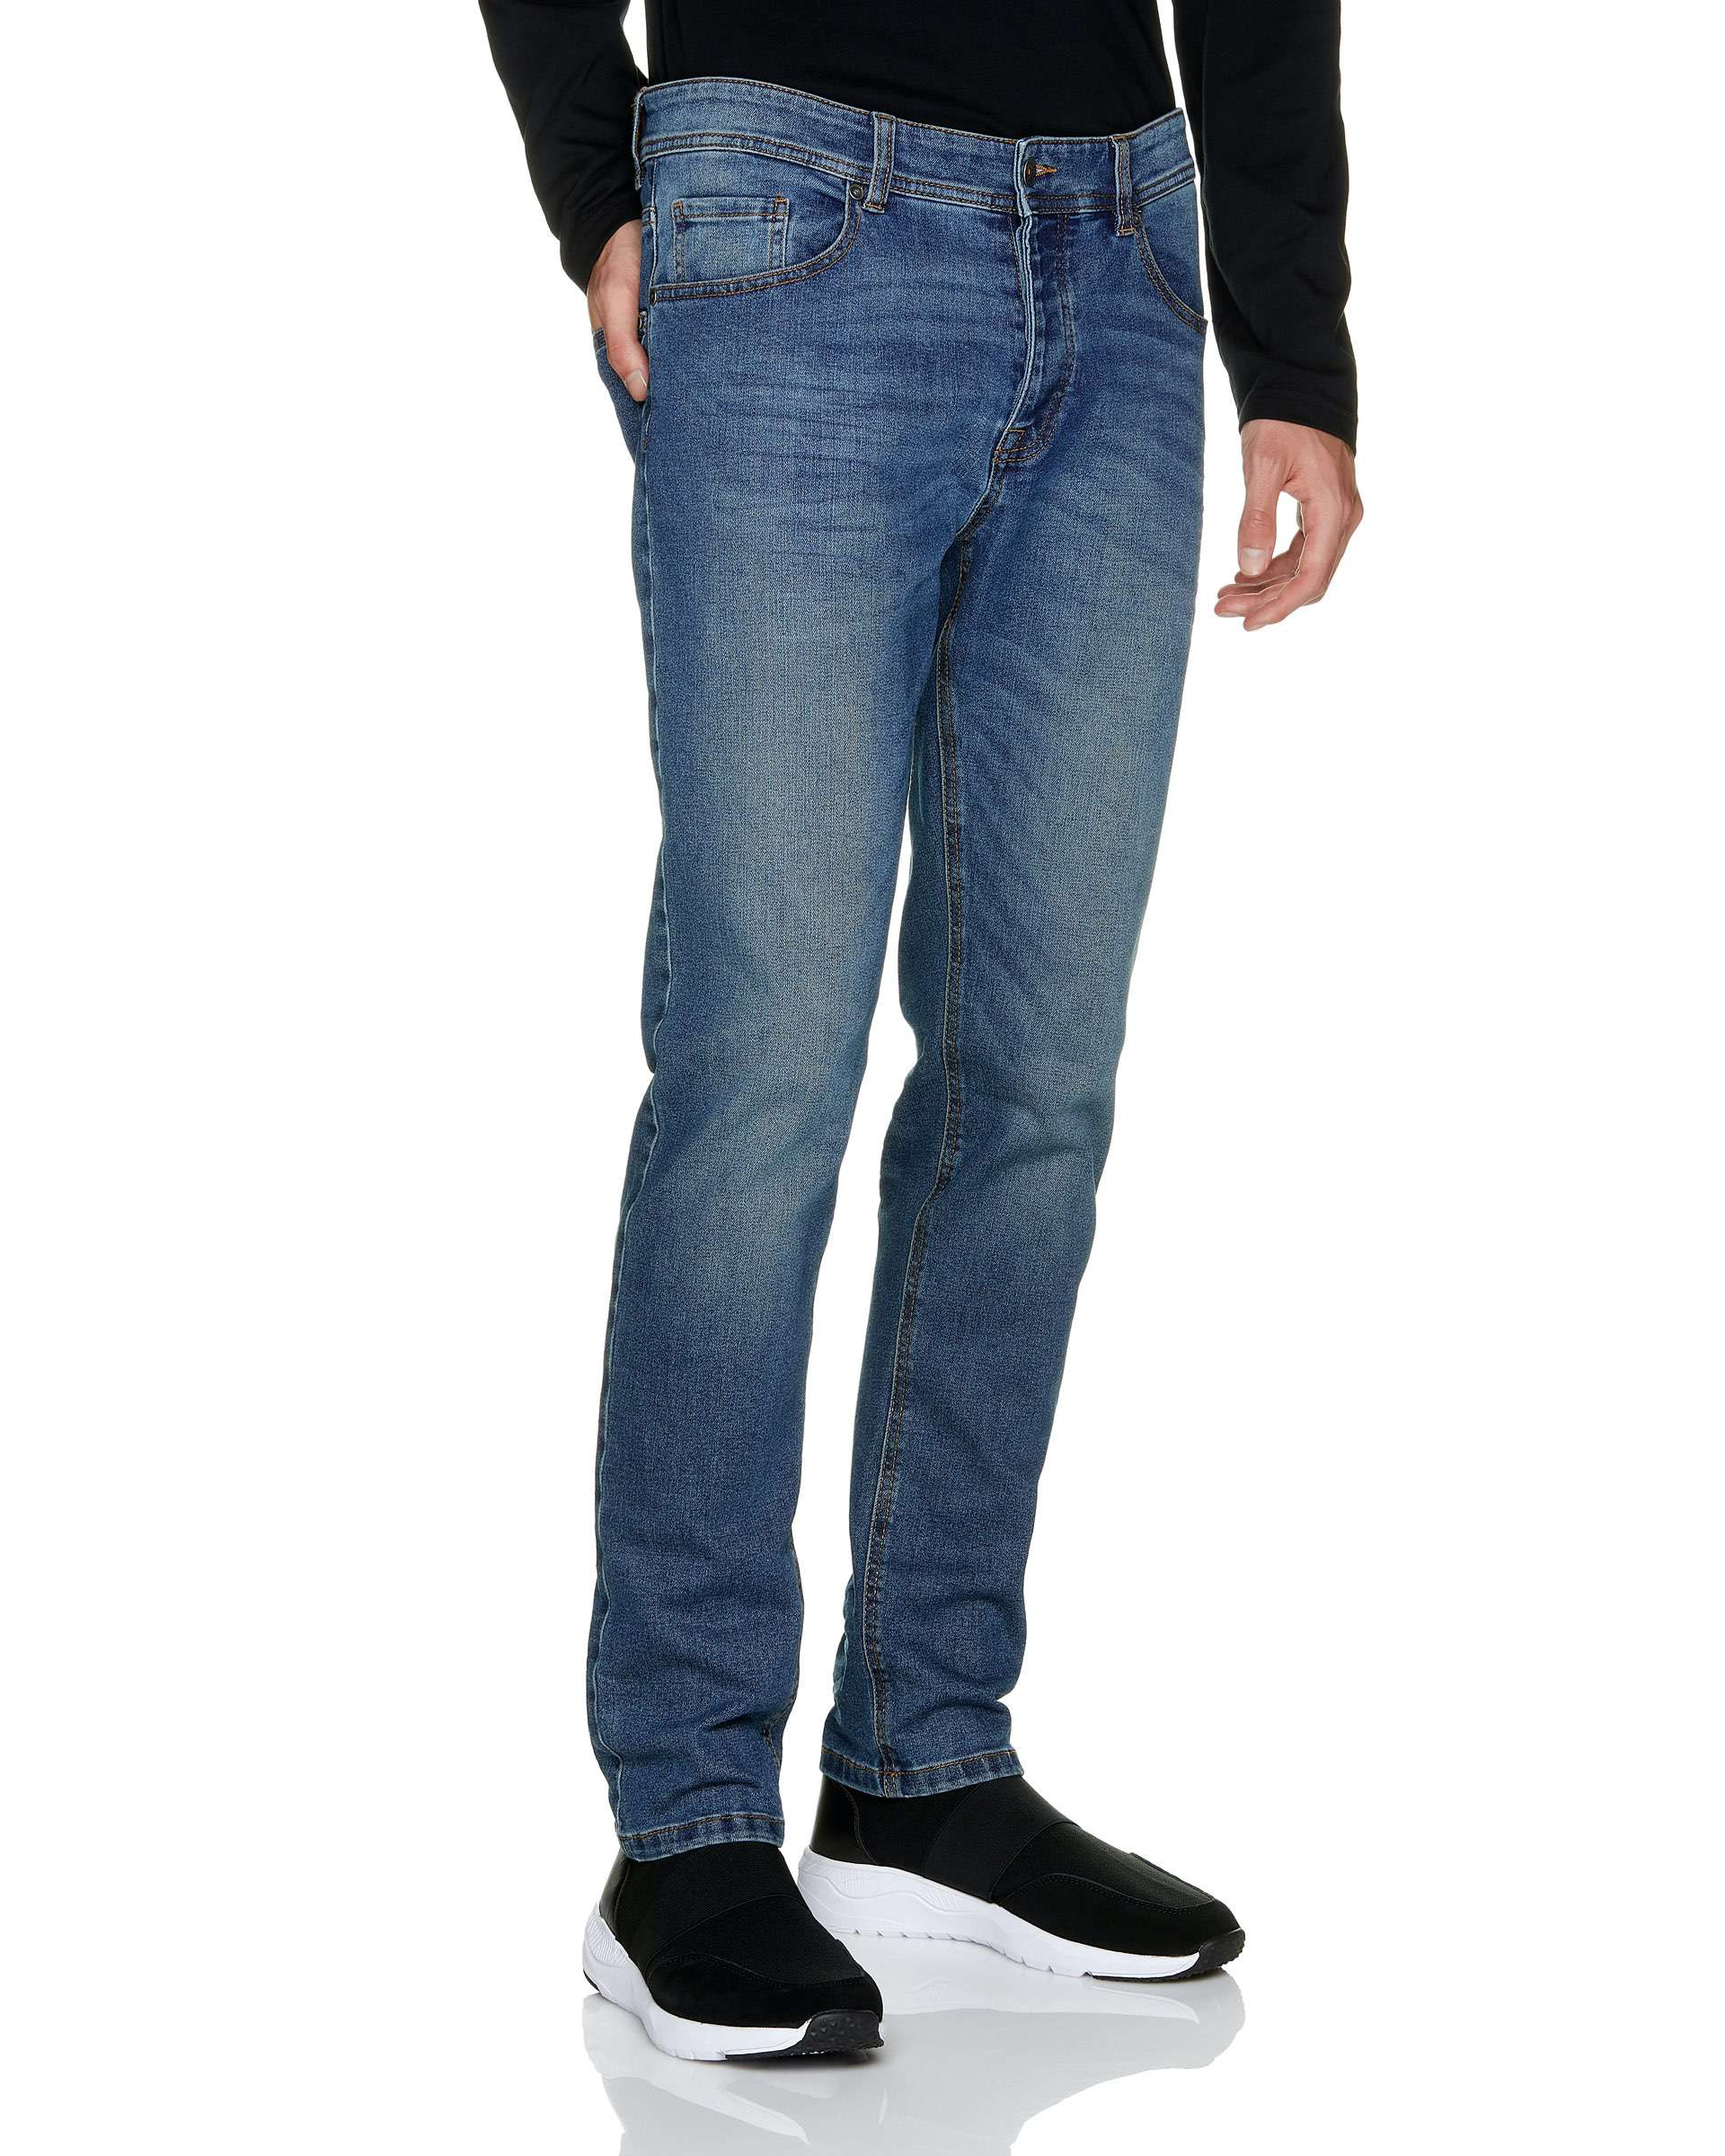 Regular Waist Slim Fit Jean